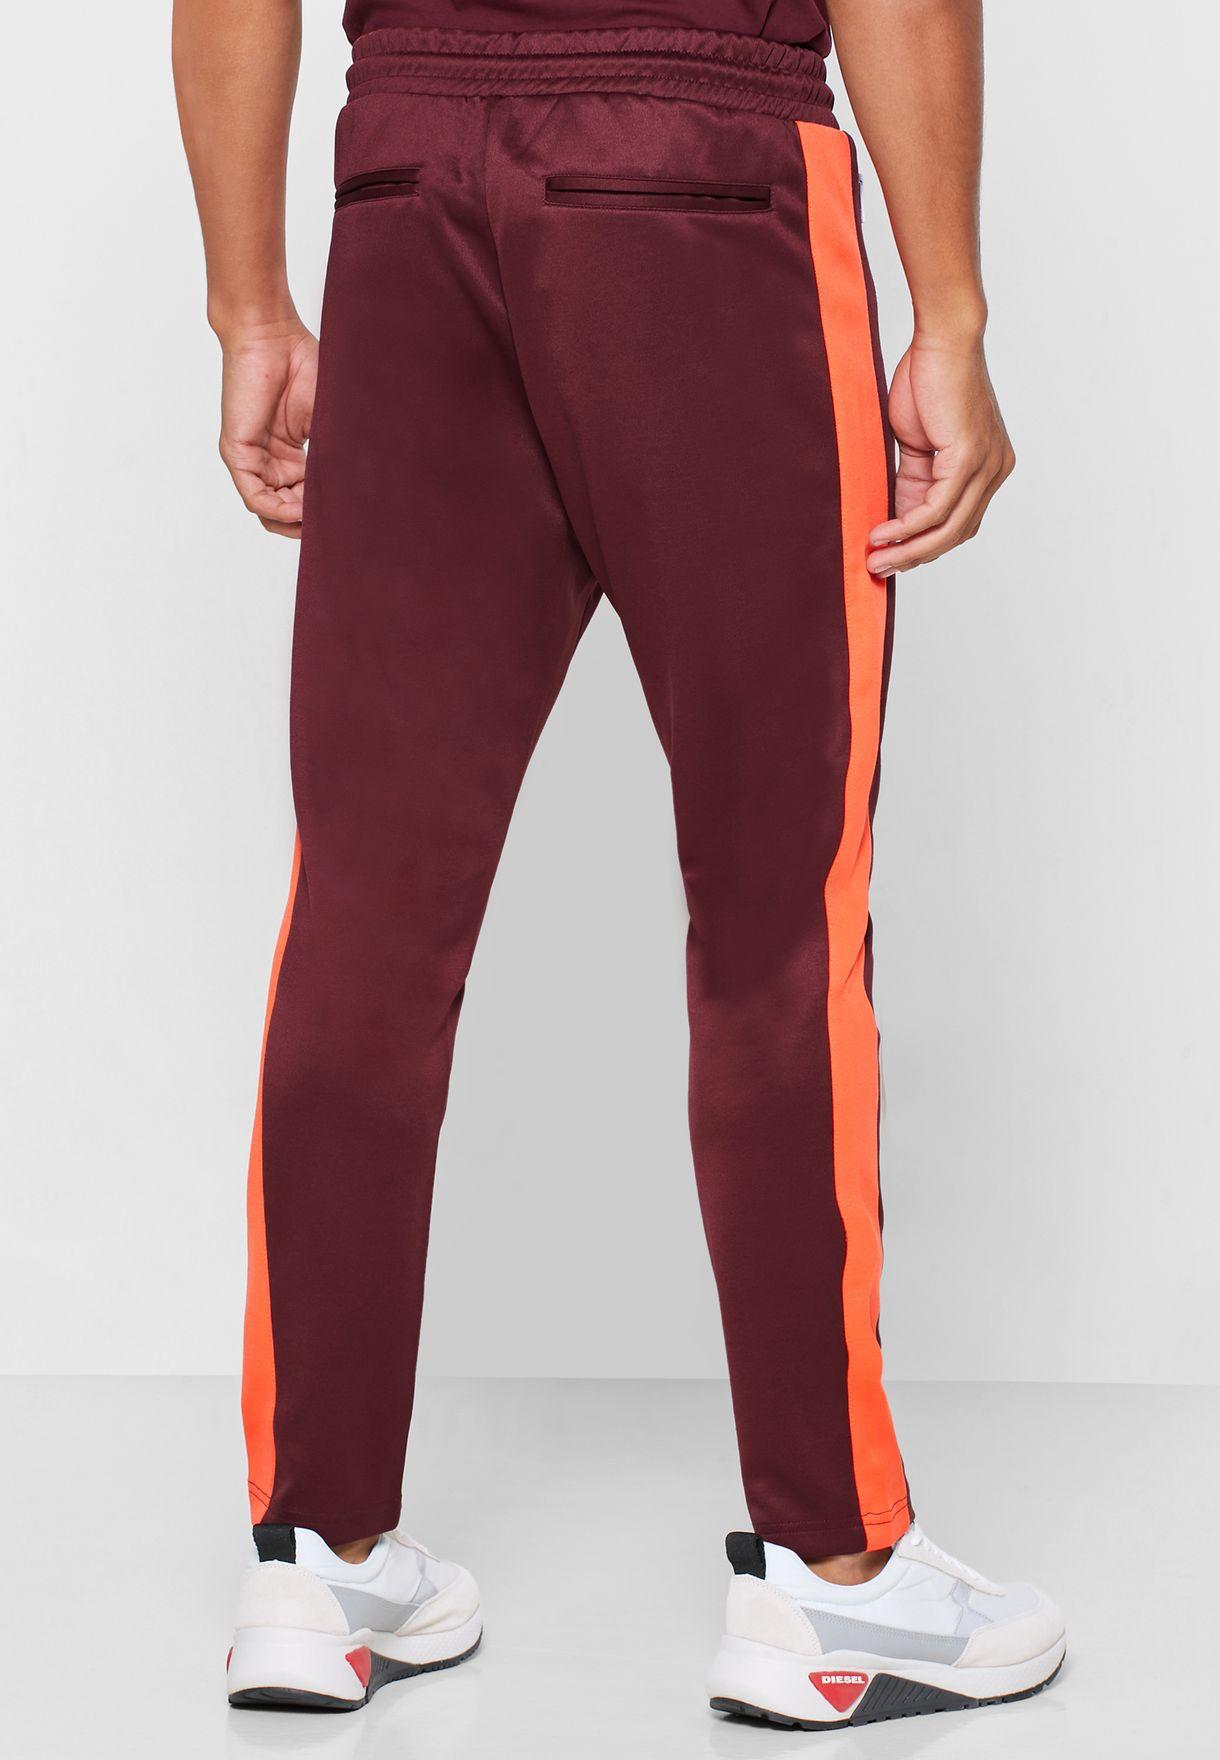 Zipped Sweatpants